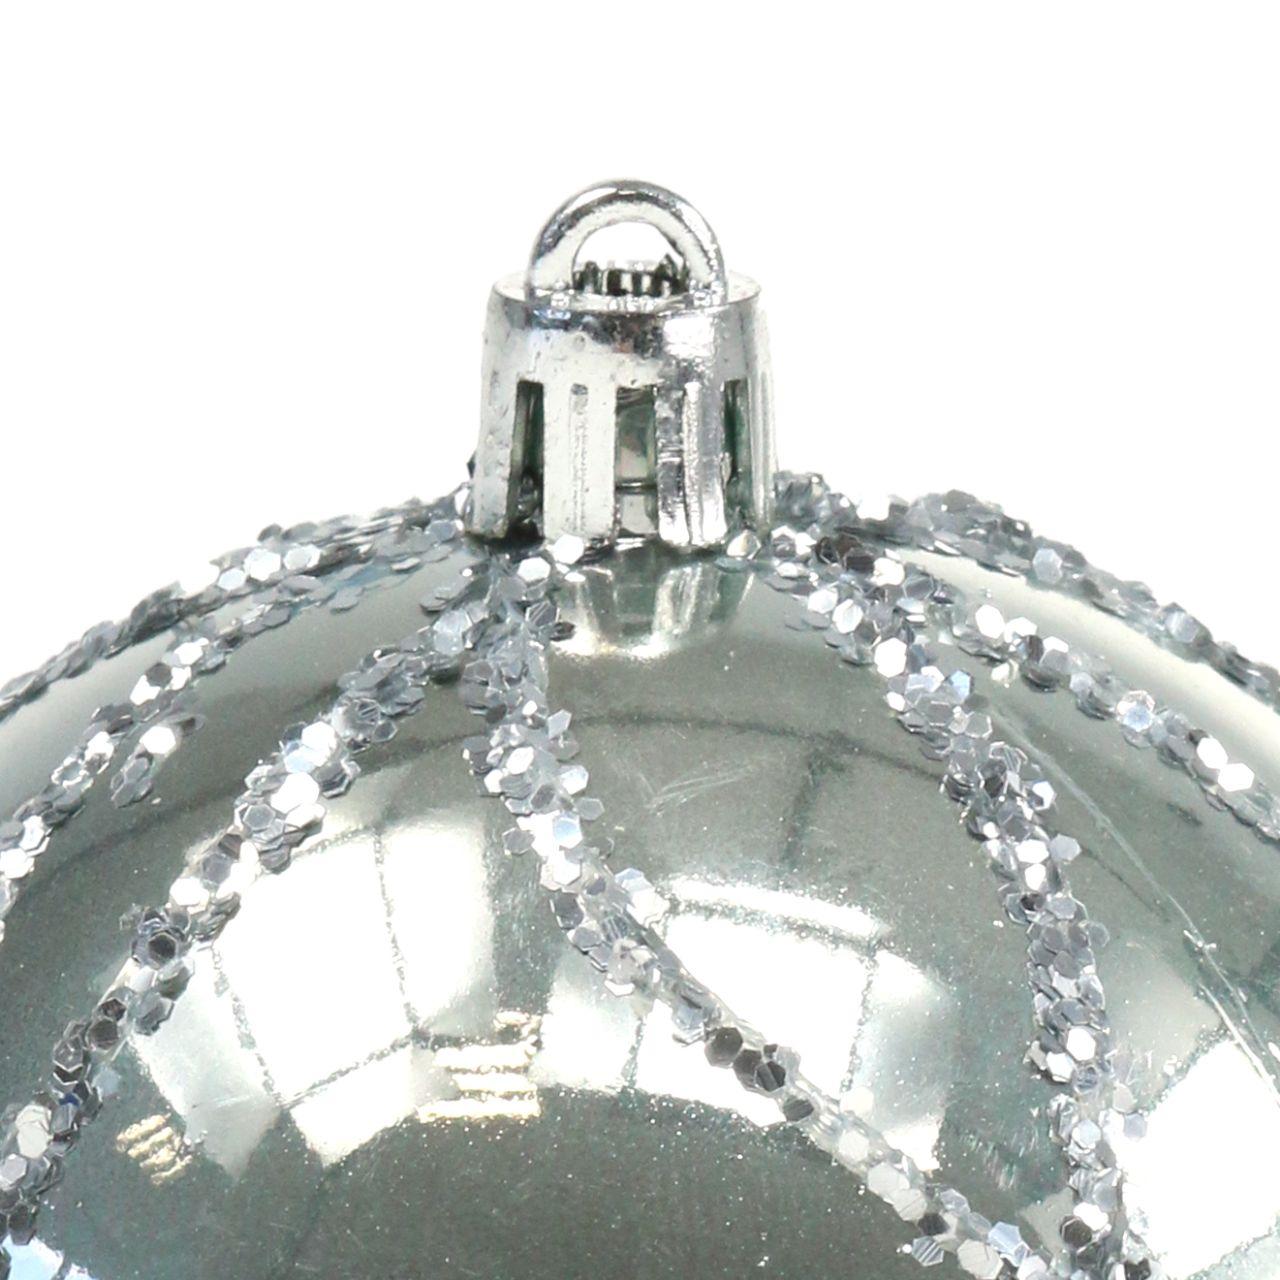 Julekule plast sølv Ø8cm 2stk